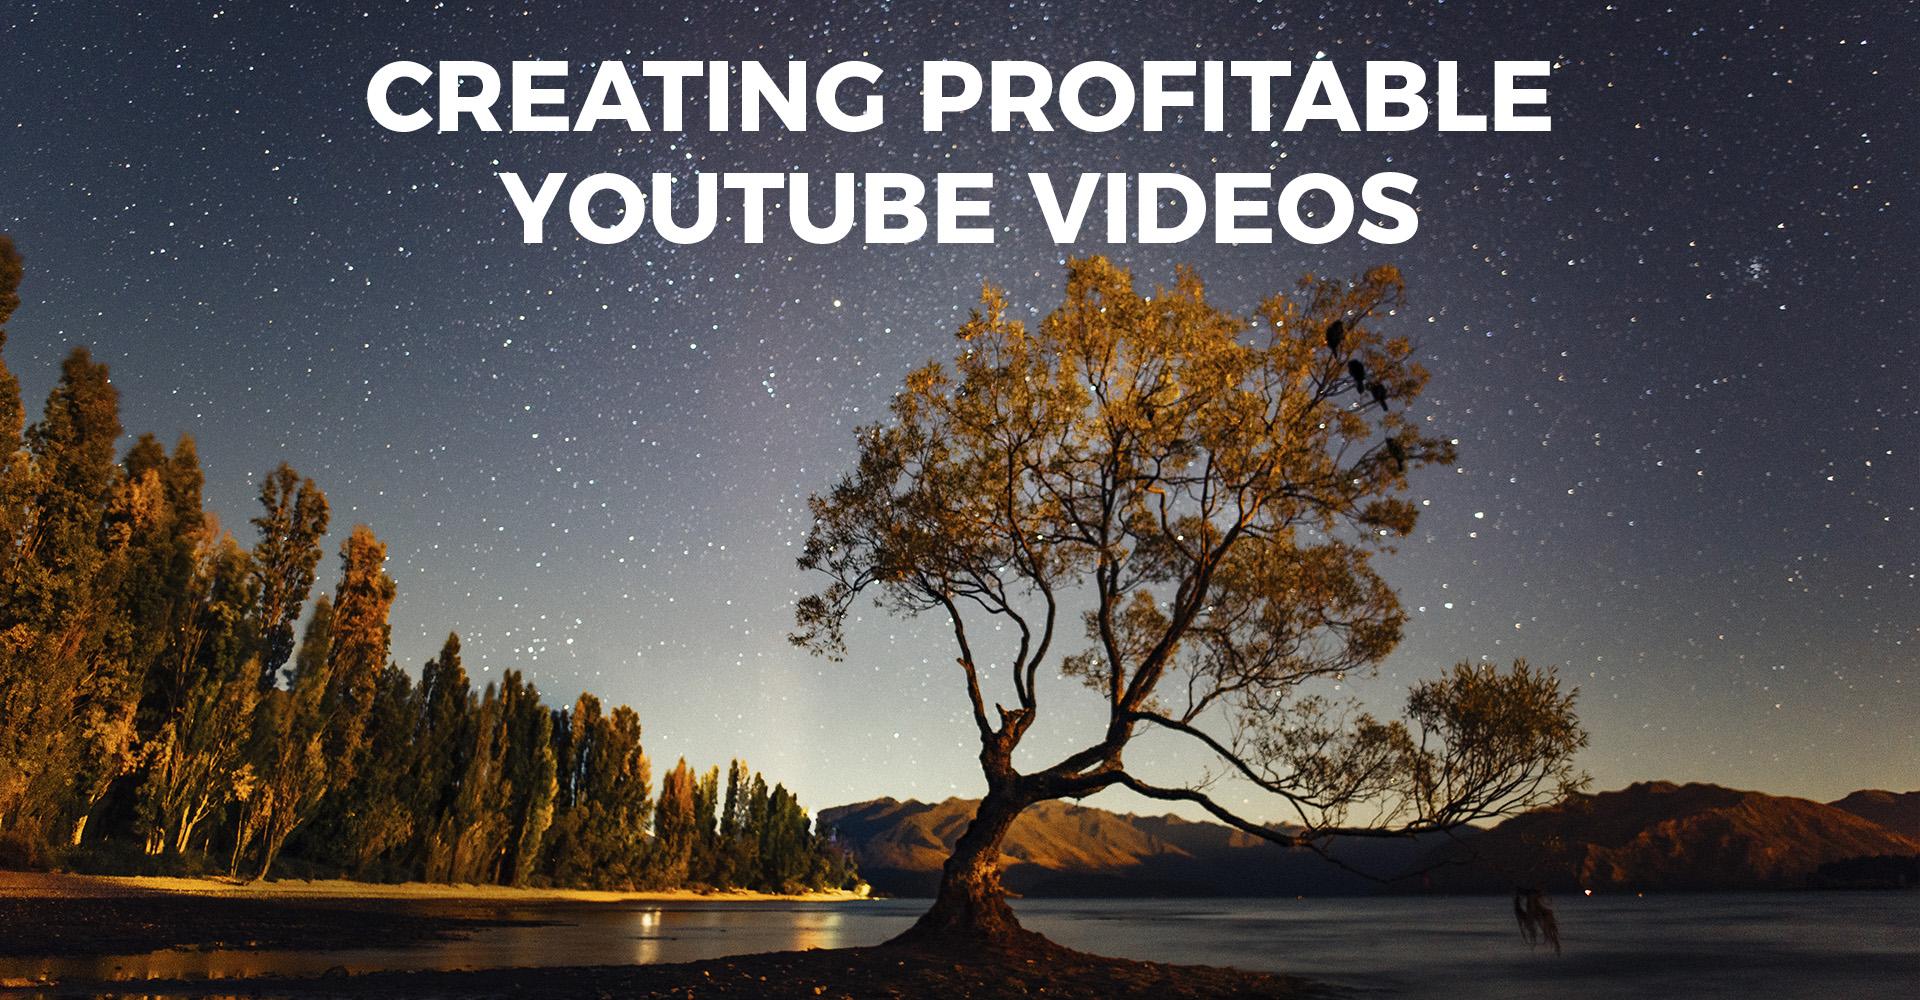 https://taylorjackson.podia.com/creating-profitable-youtube-videos